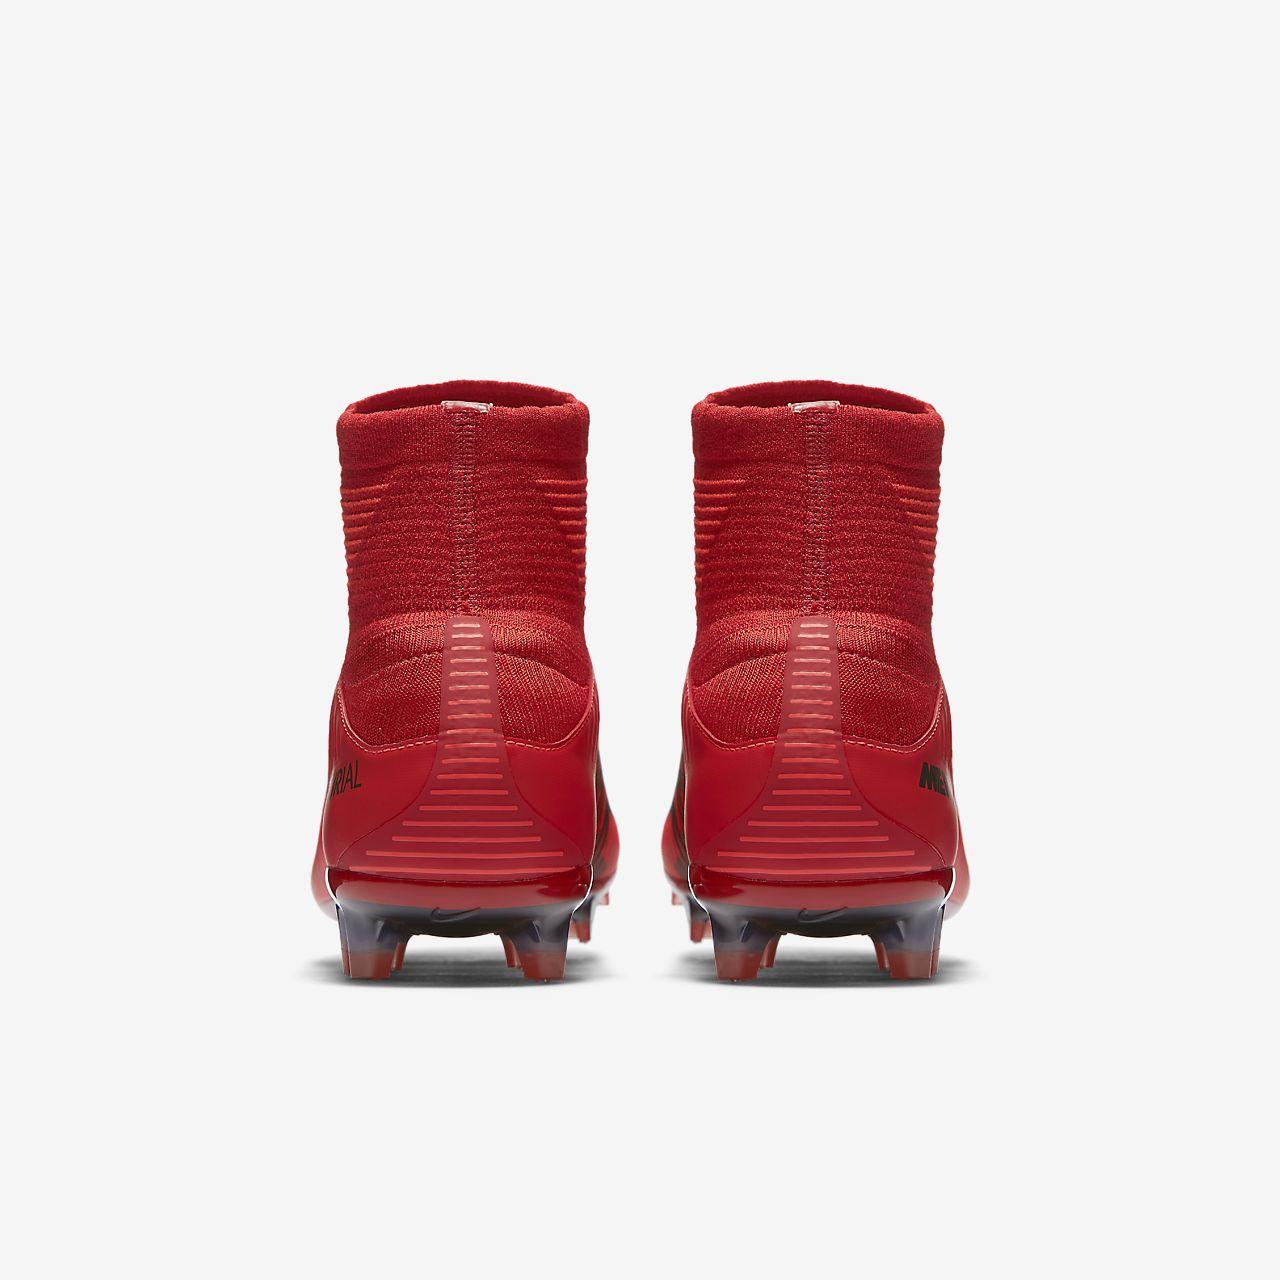 chaussure de football à crampons pour terrain sec nike mercurial veloce iii dynamic fit